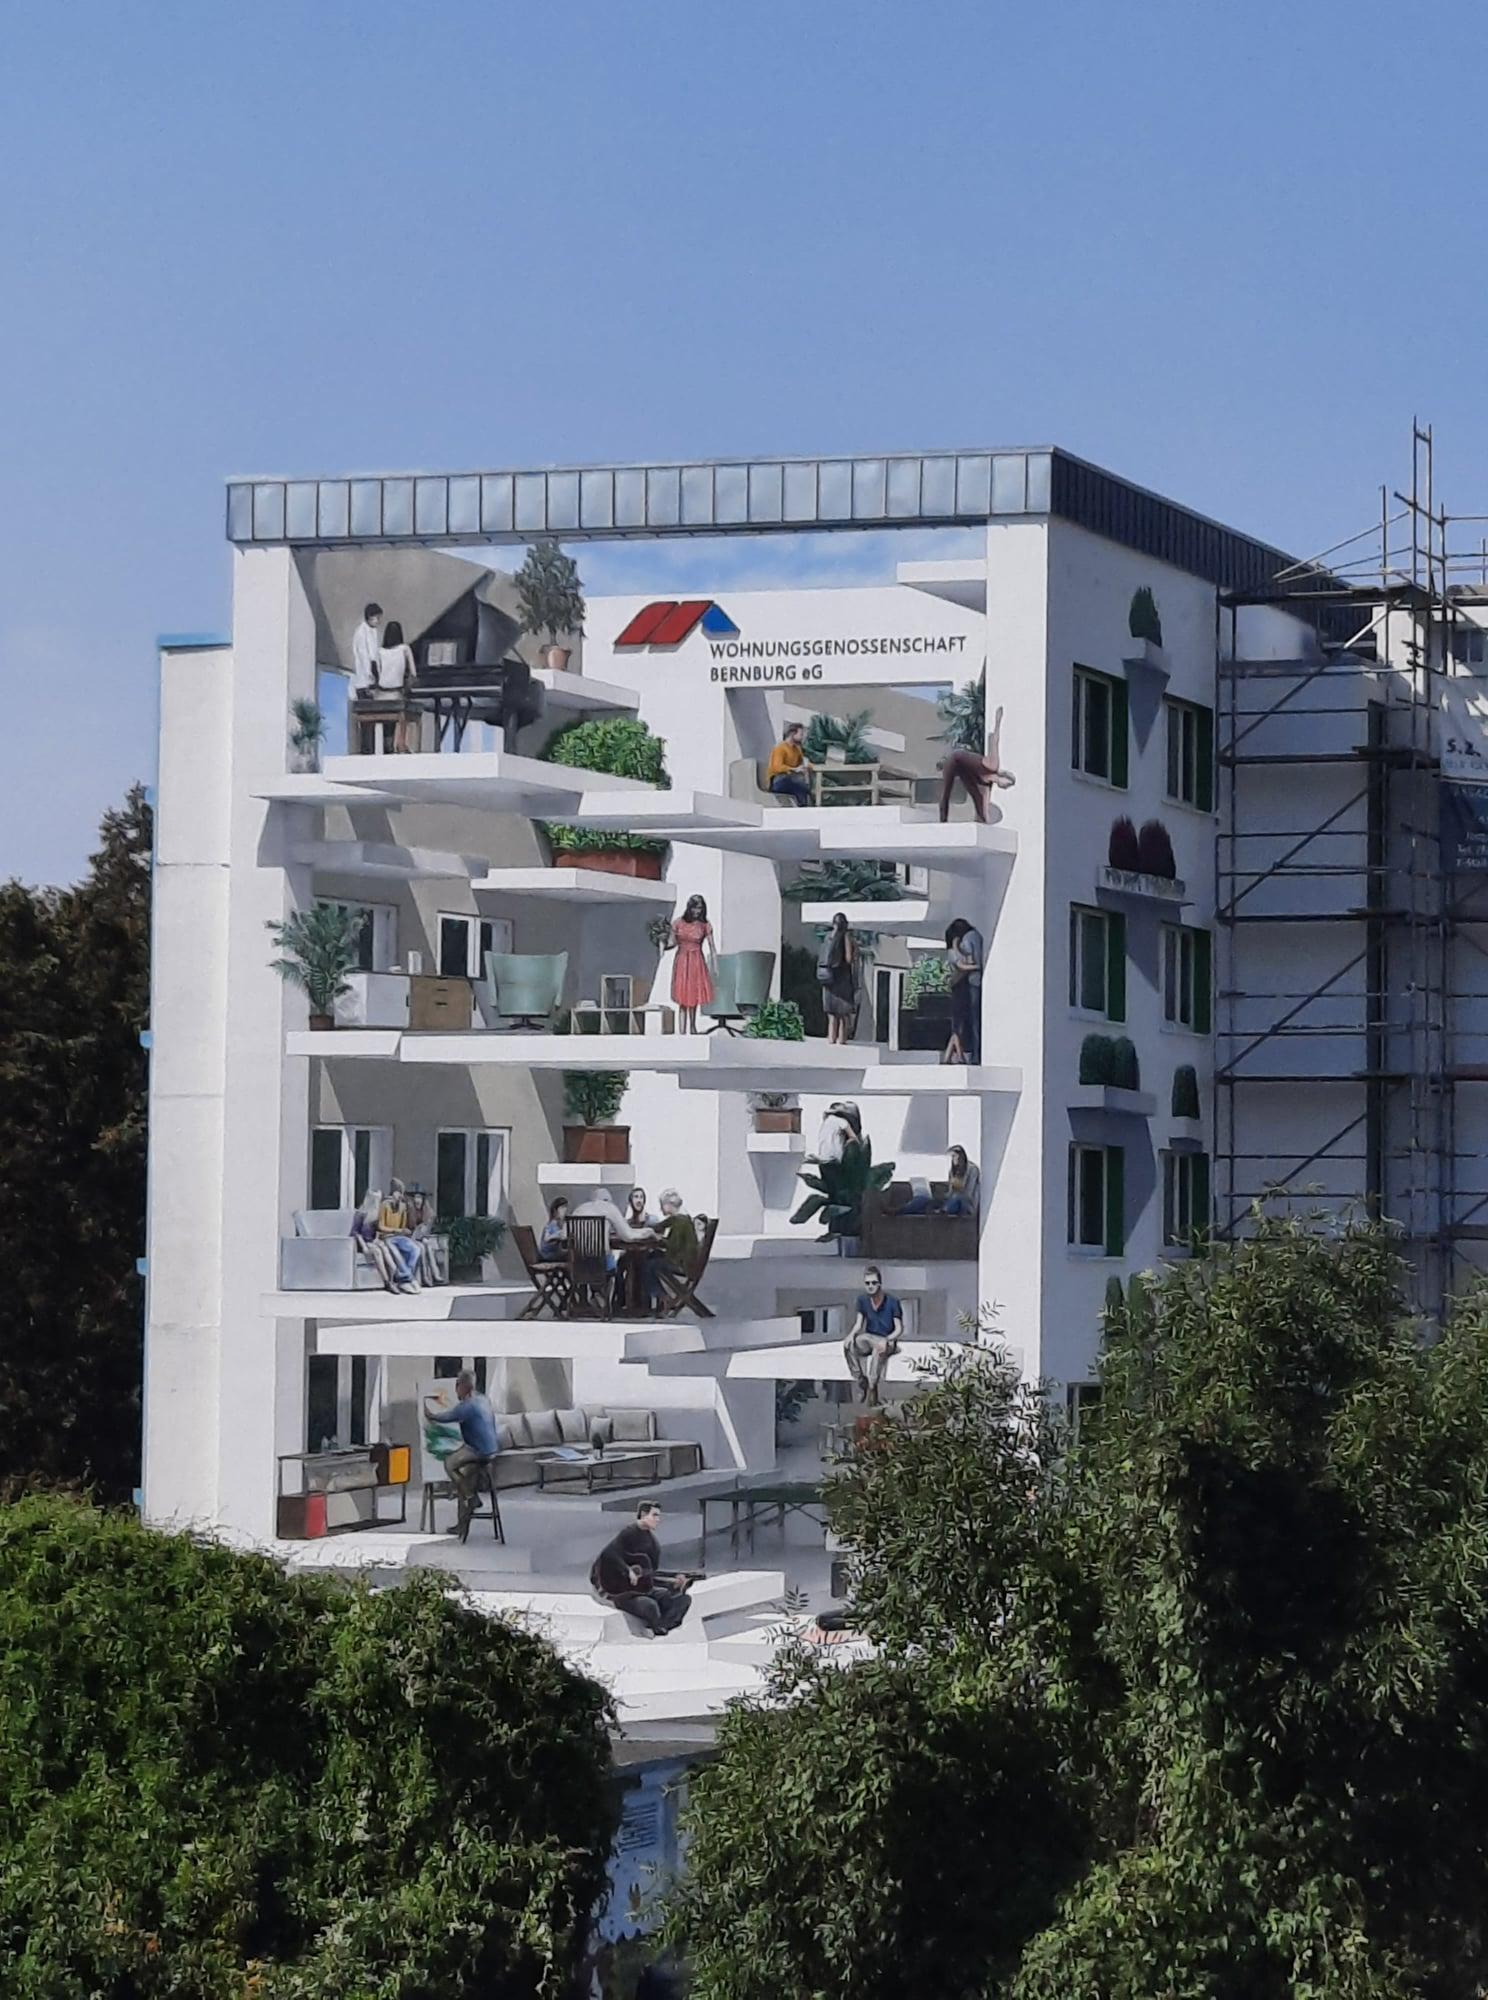 Marco Brzozowski zaubert Fassadenkunstwerk in Bernburg